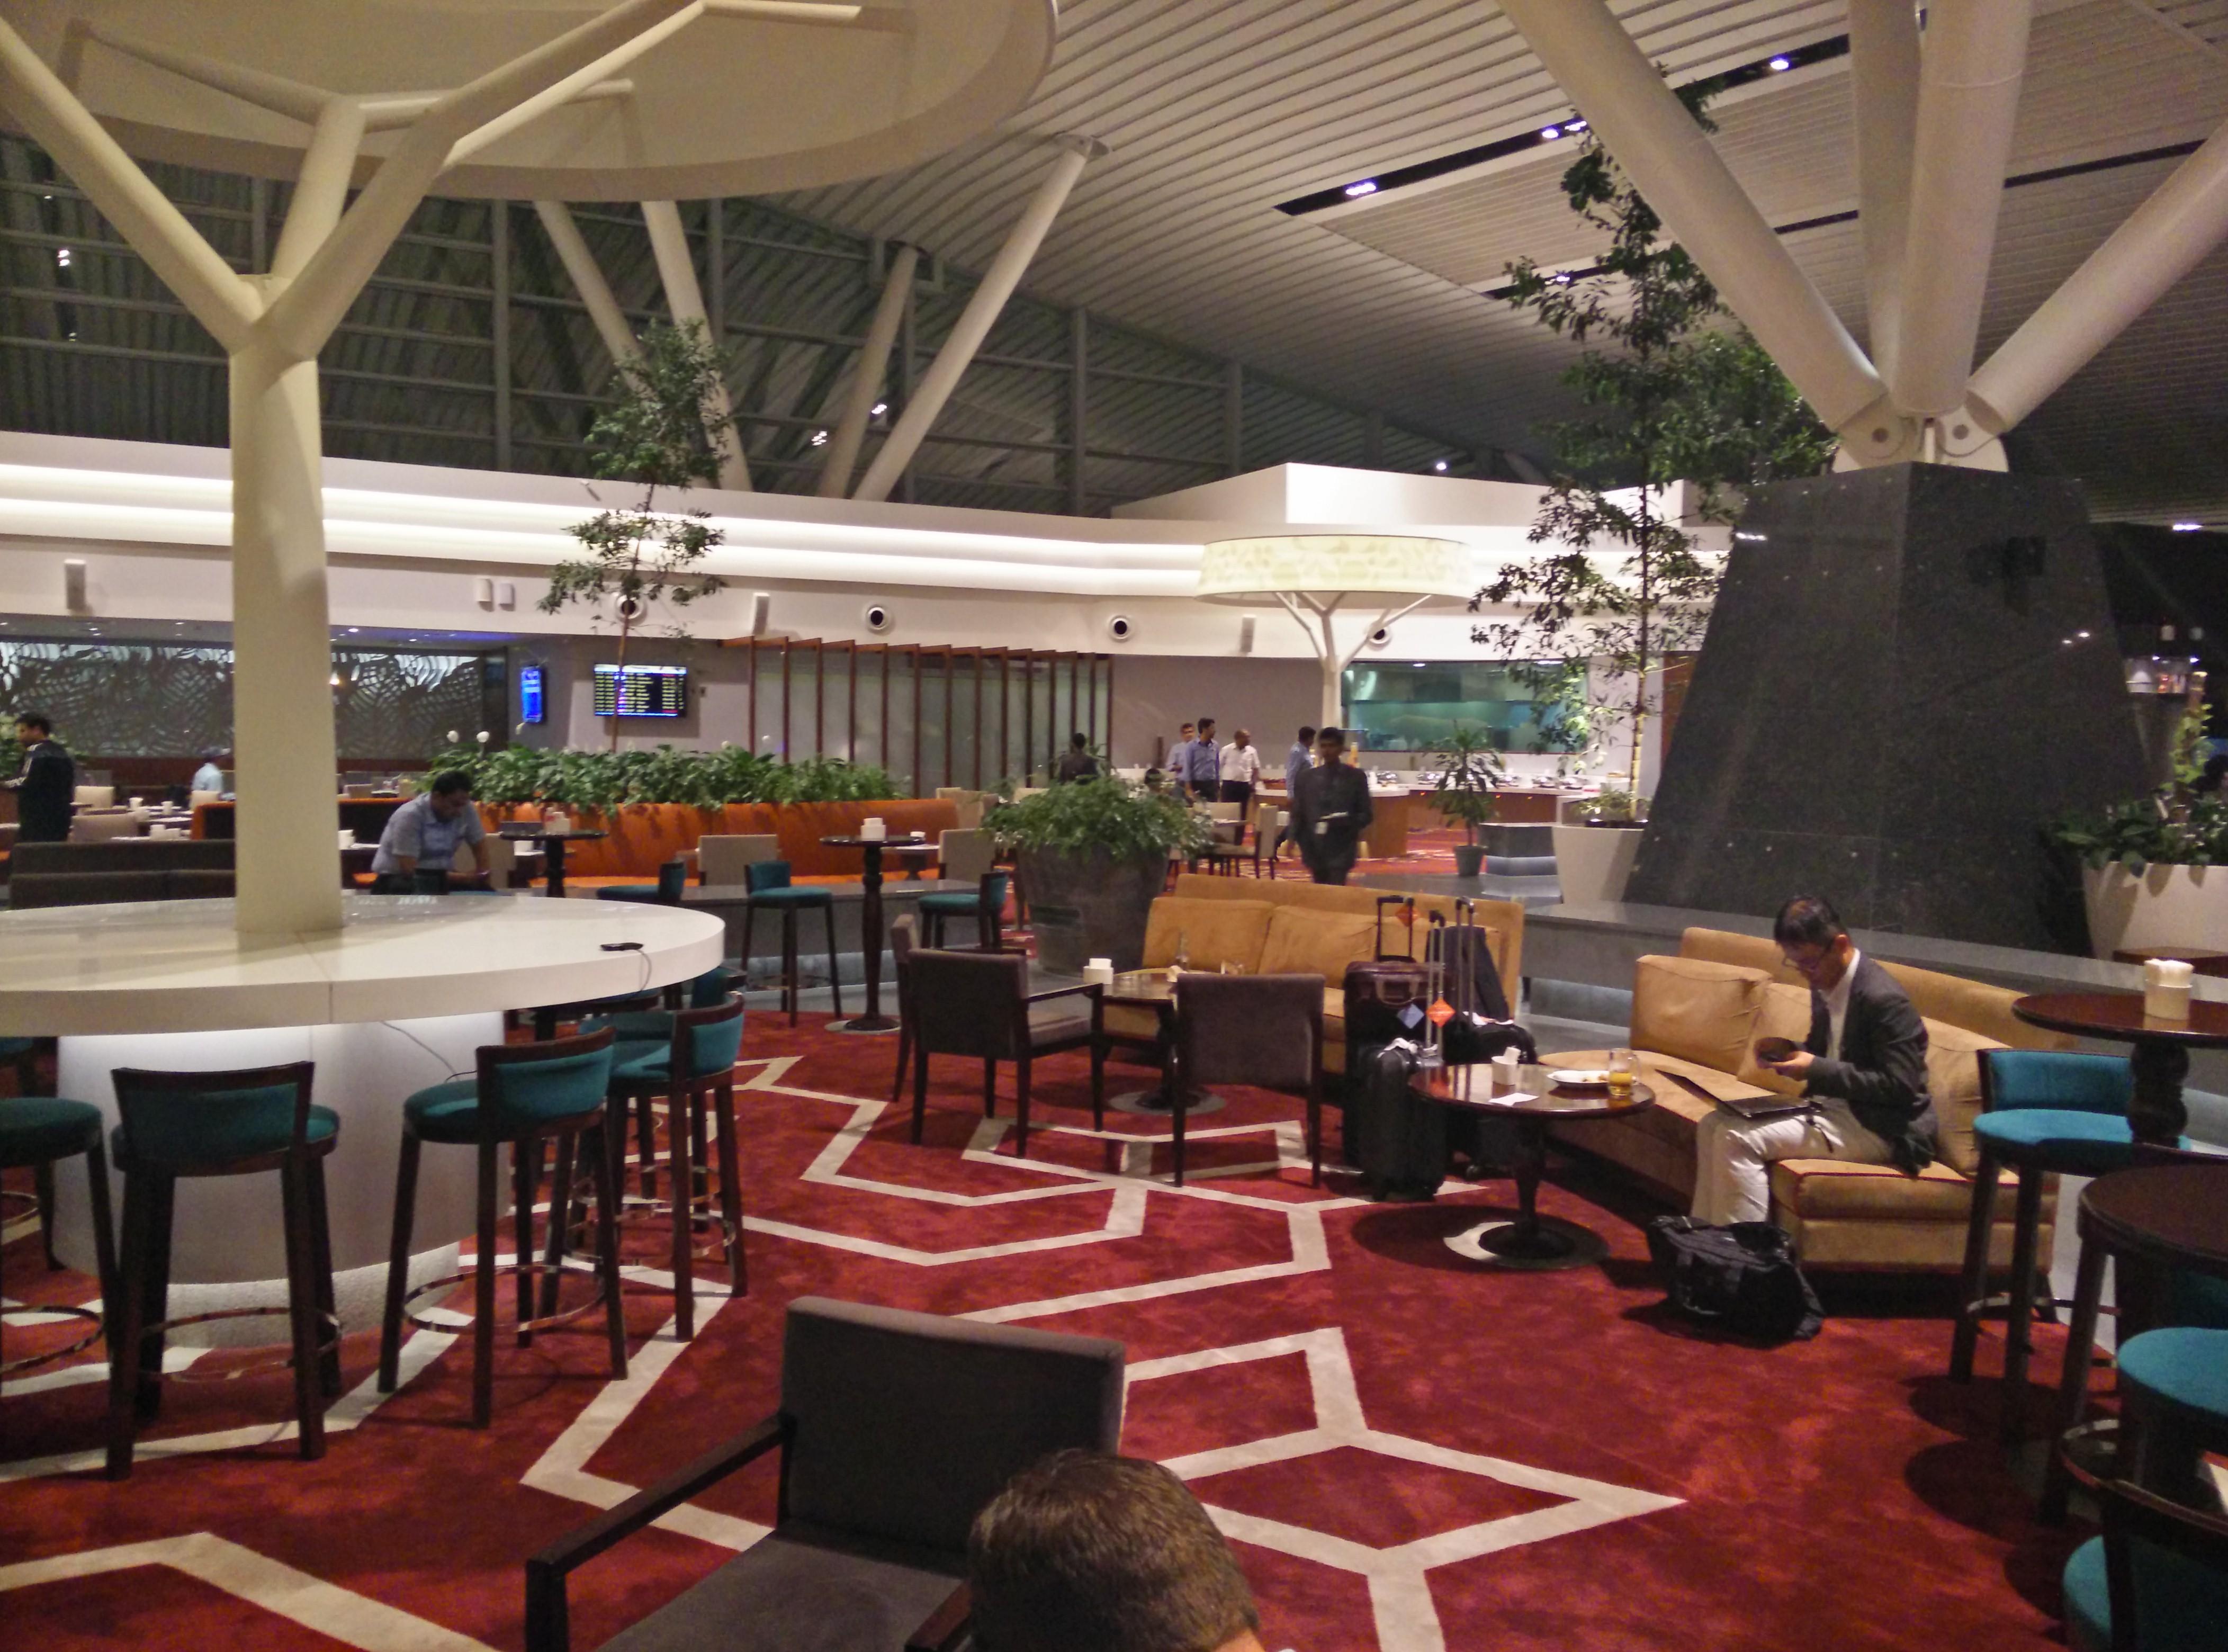 Above Ground Level Lounge ambiance